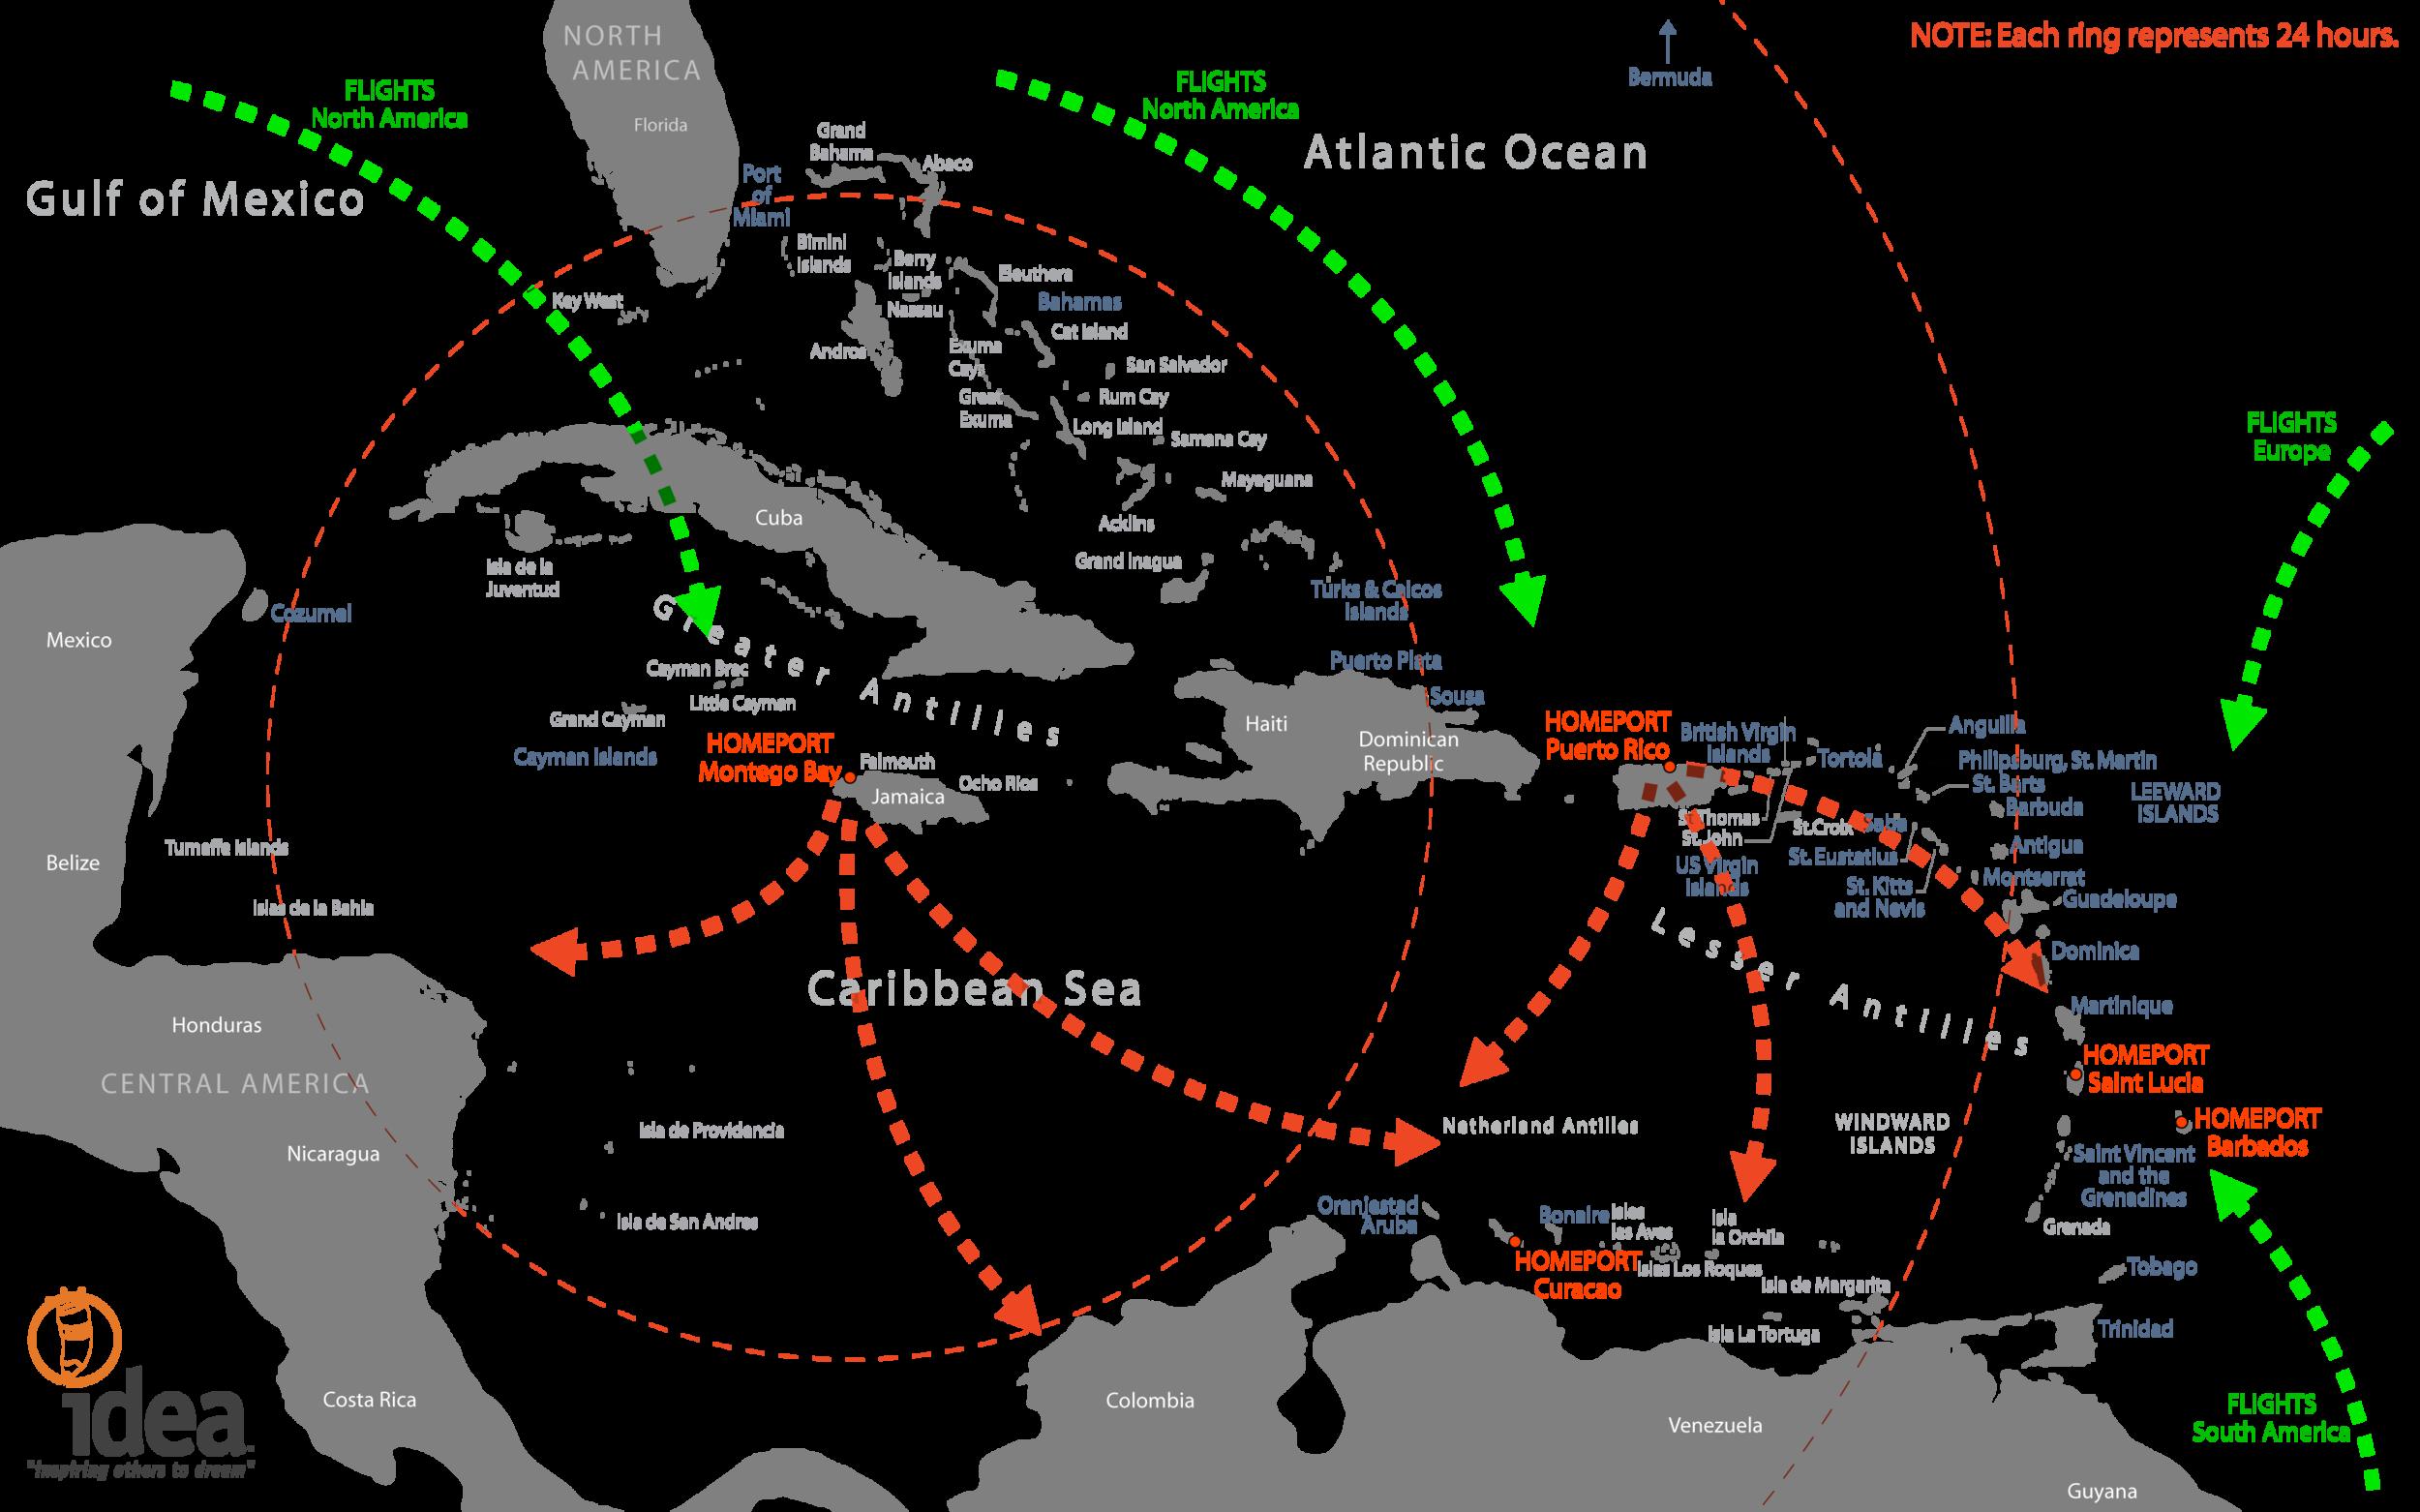 IDEA_HomePorts-Caribbean.png